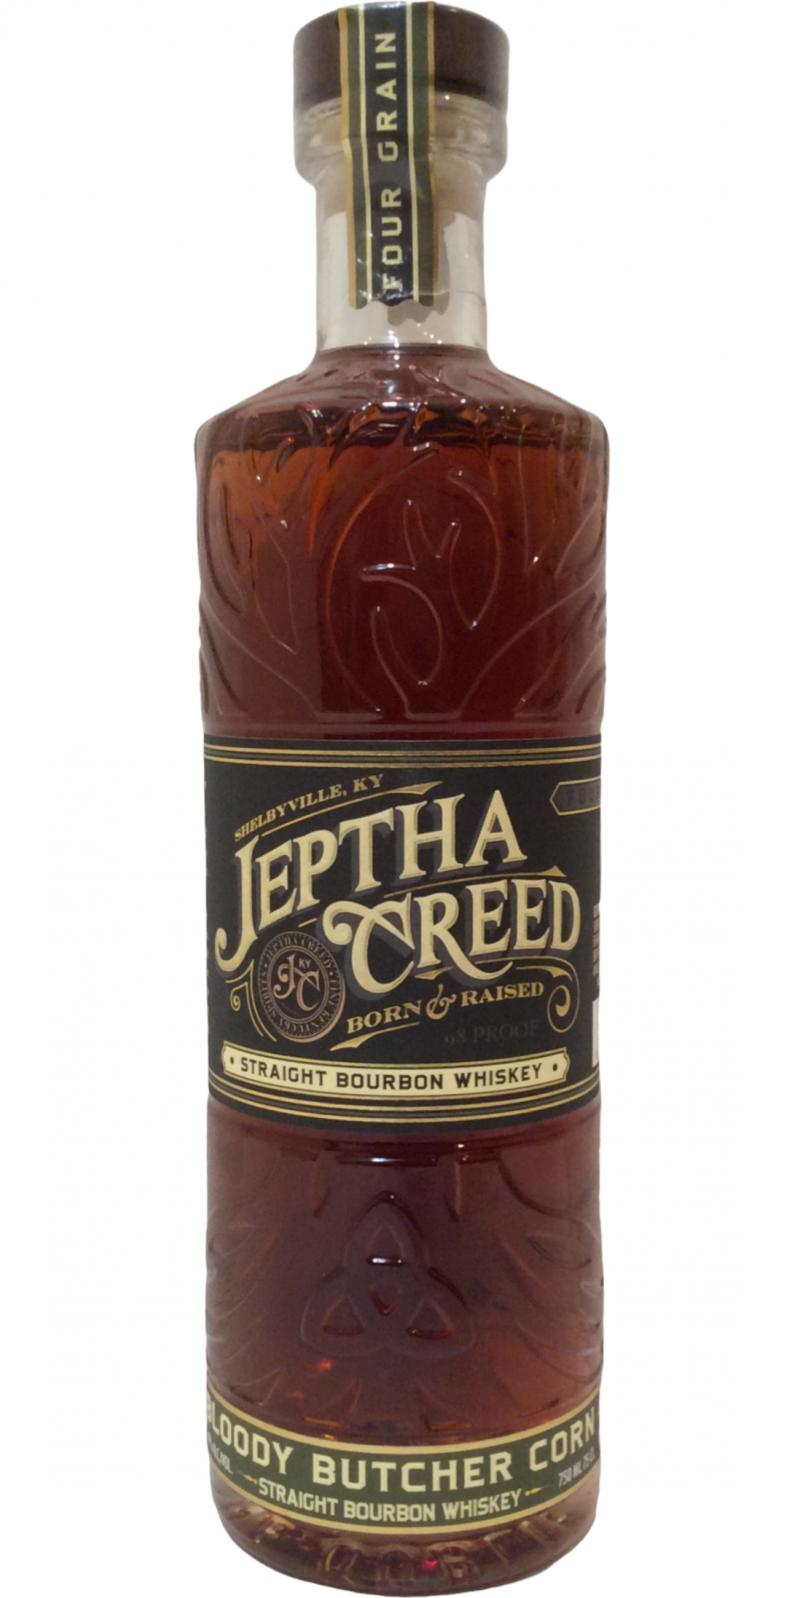 Jeptha Creed Bloody Butcher Corn